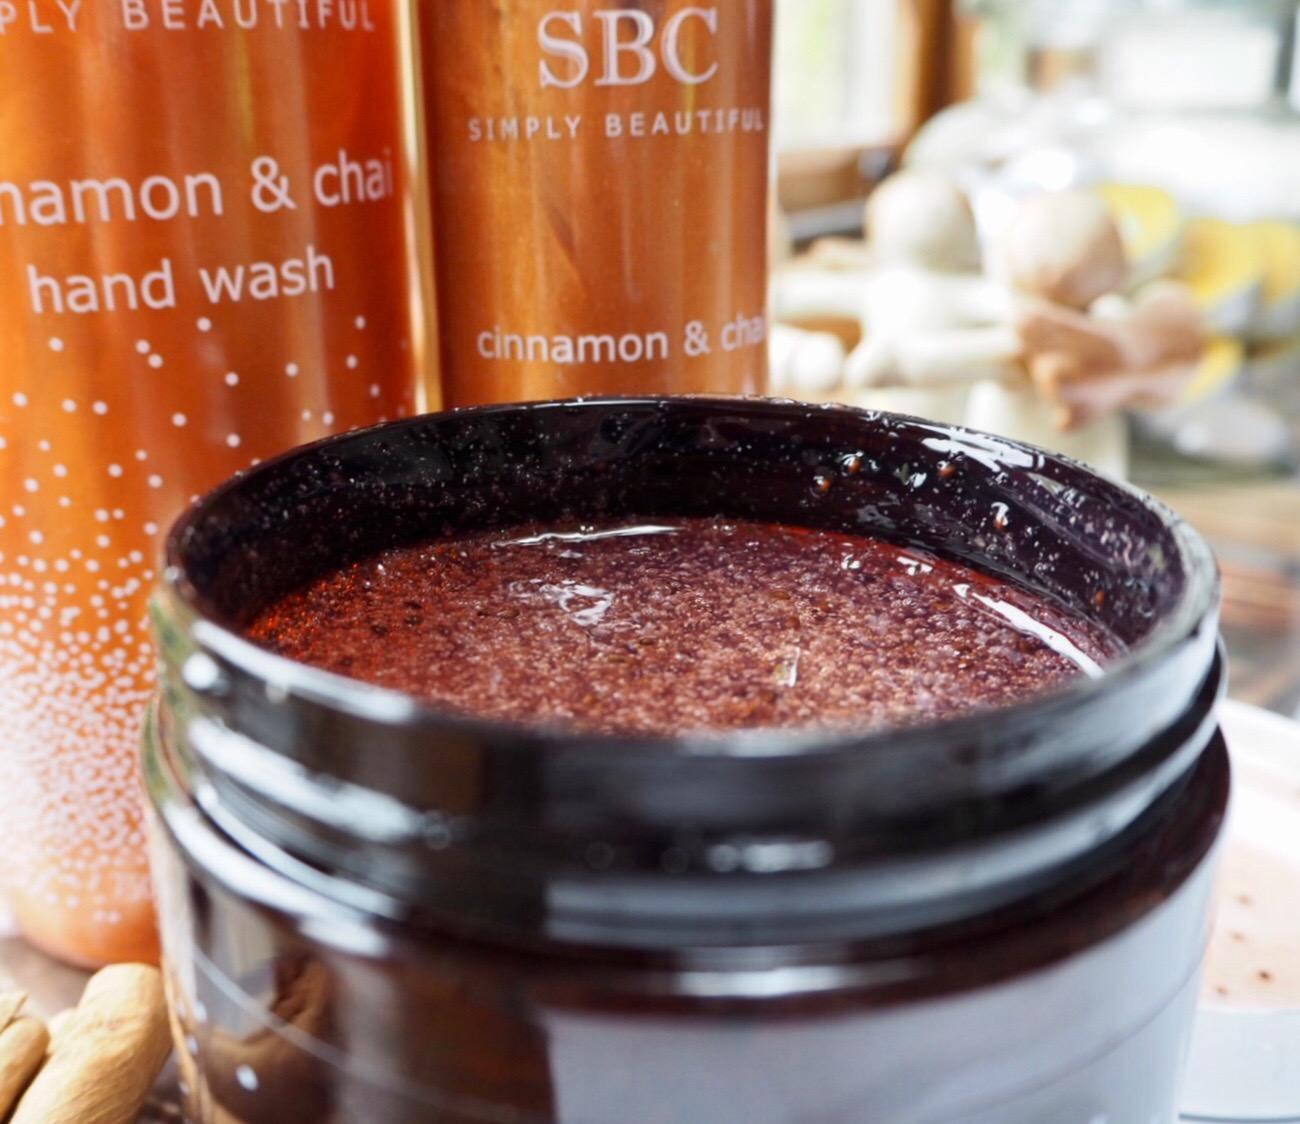 SBC new seasonal bath and body Cinnamon and chai